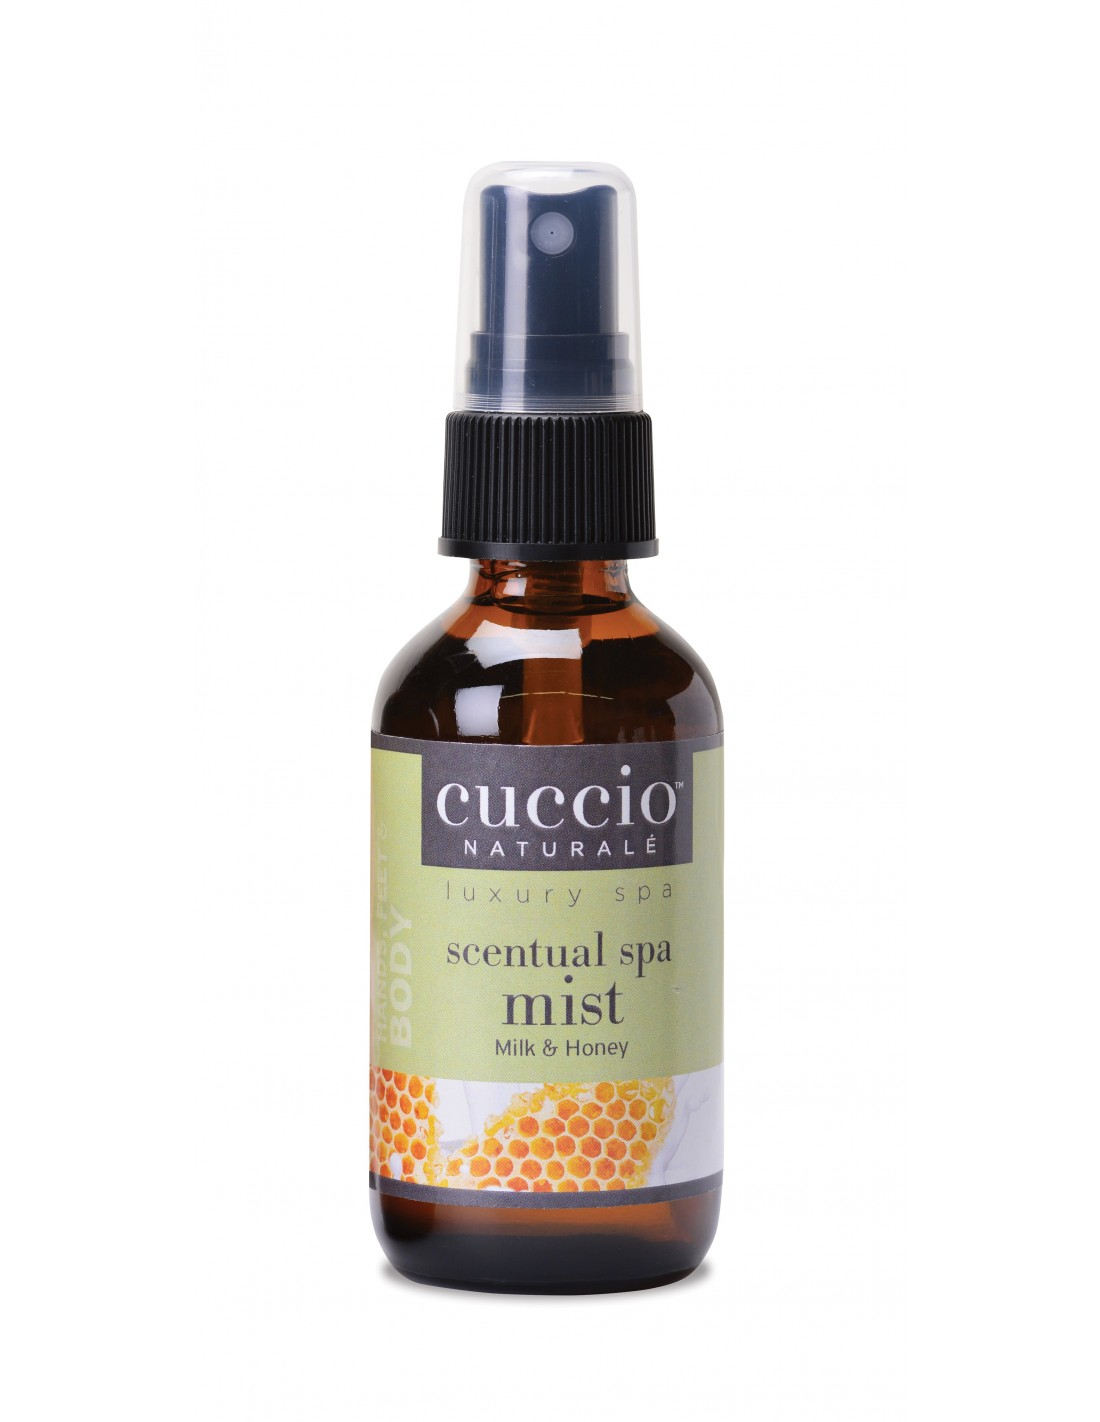 Elixir Cuccio - Scentual SPA Mist - Milk and Honey - 60ml - CNSP1002